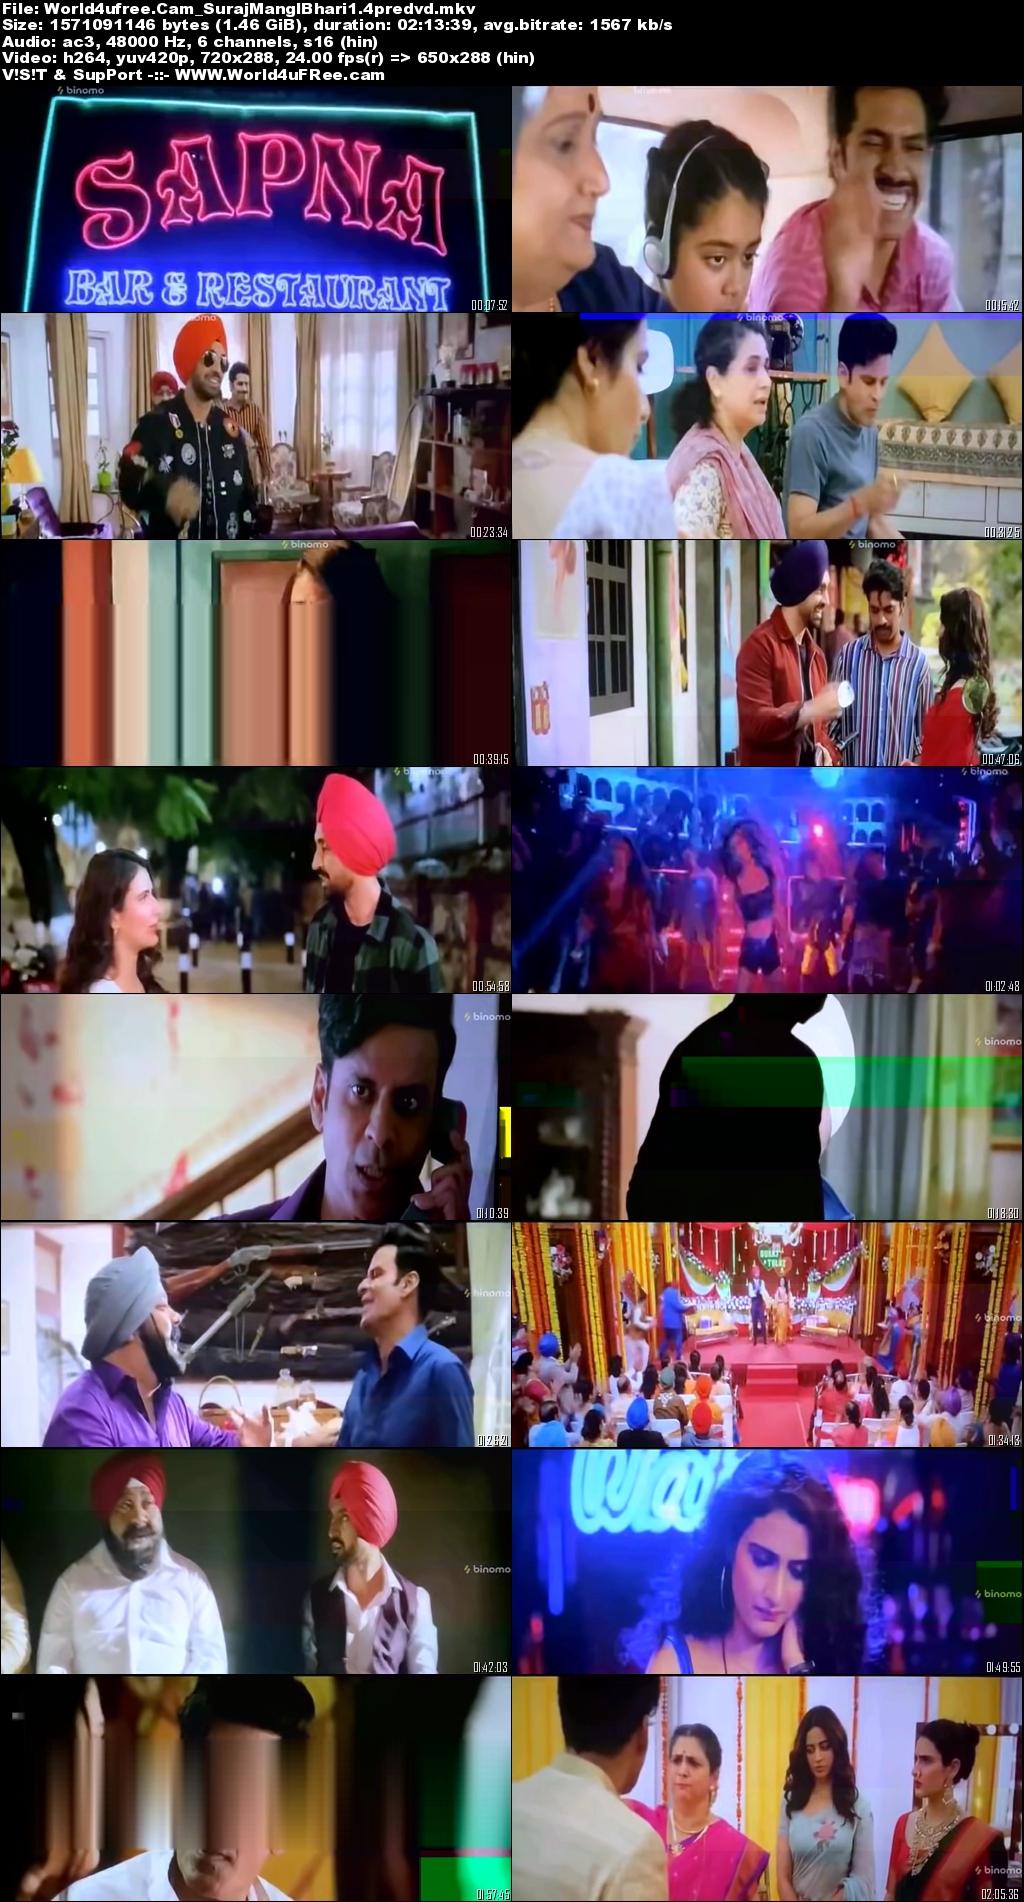 Suraj Pe Mangal Bhari (2020) Hindi Movie Pre-DVDRip x264 1.4Gb MKV